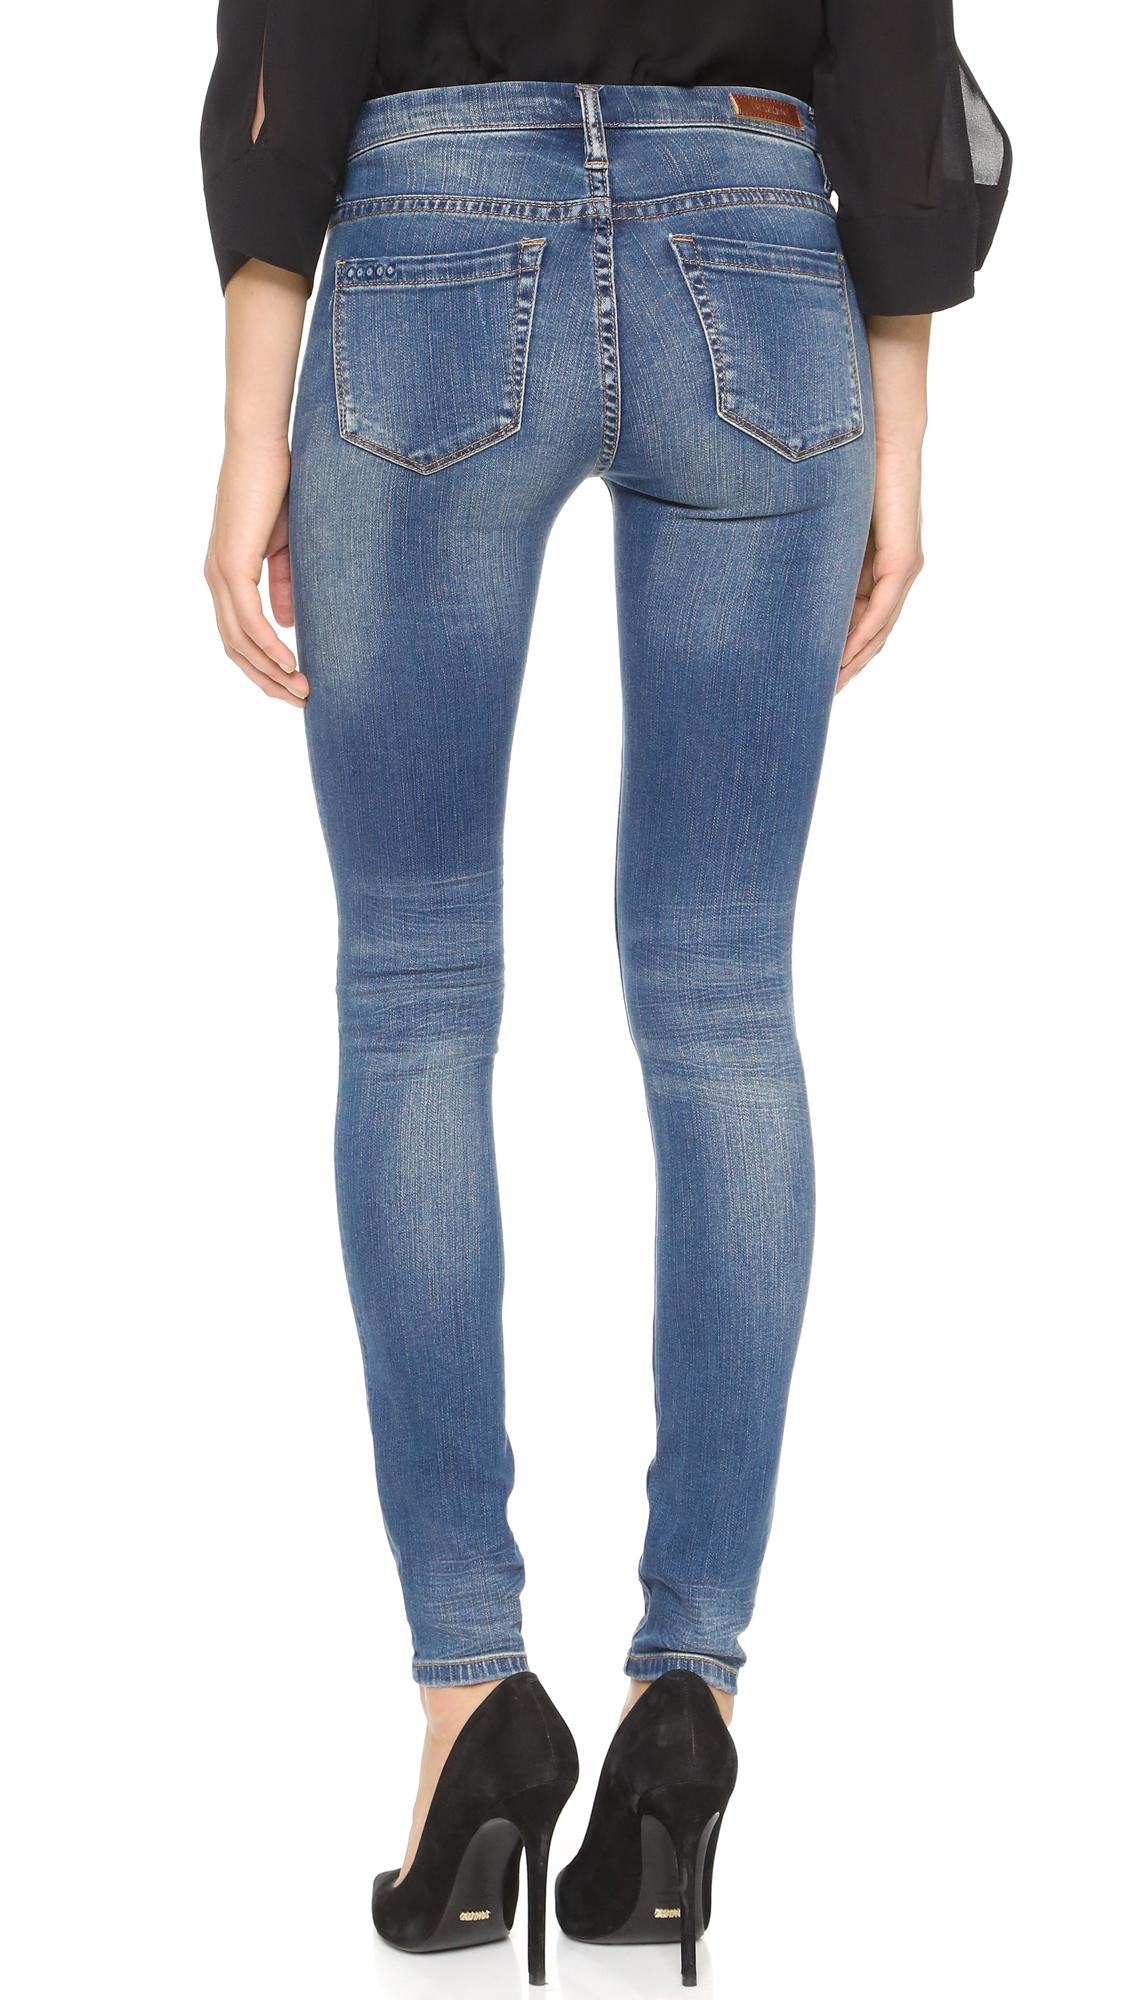 Blank PANTALONES - Pantalones qEDWMZuM